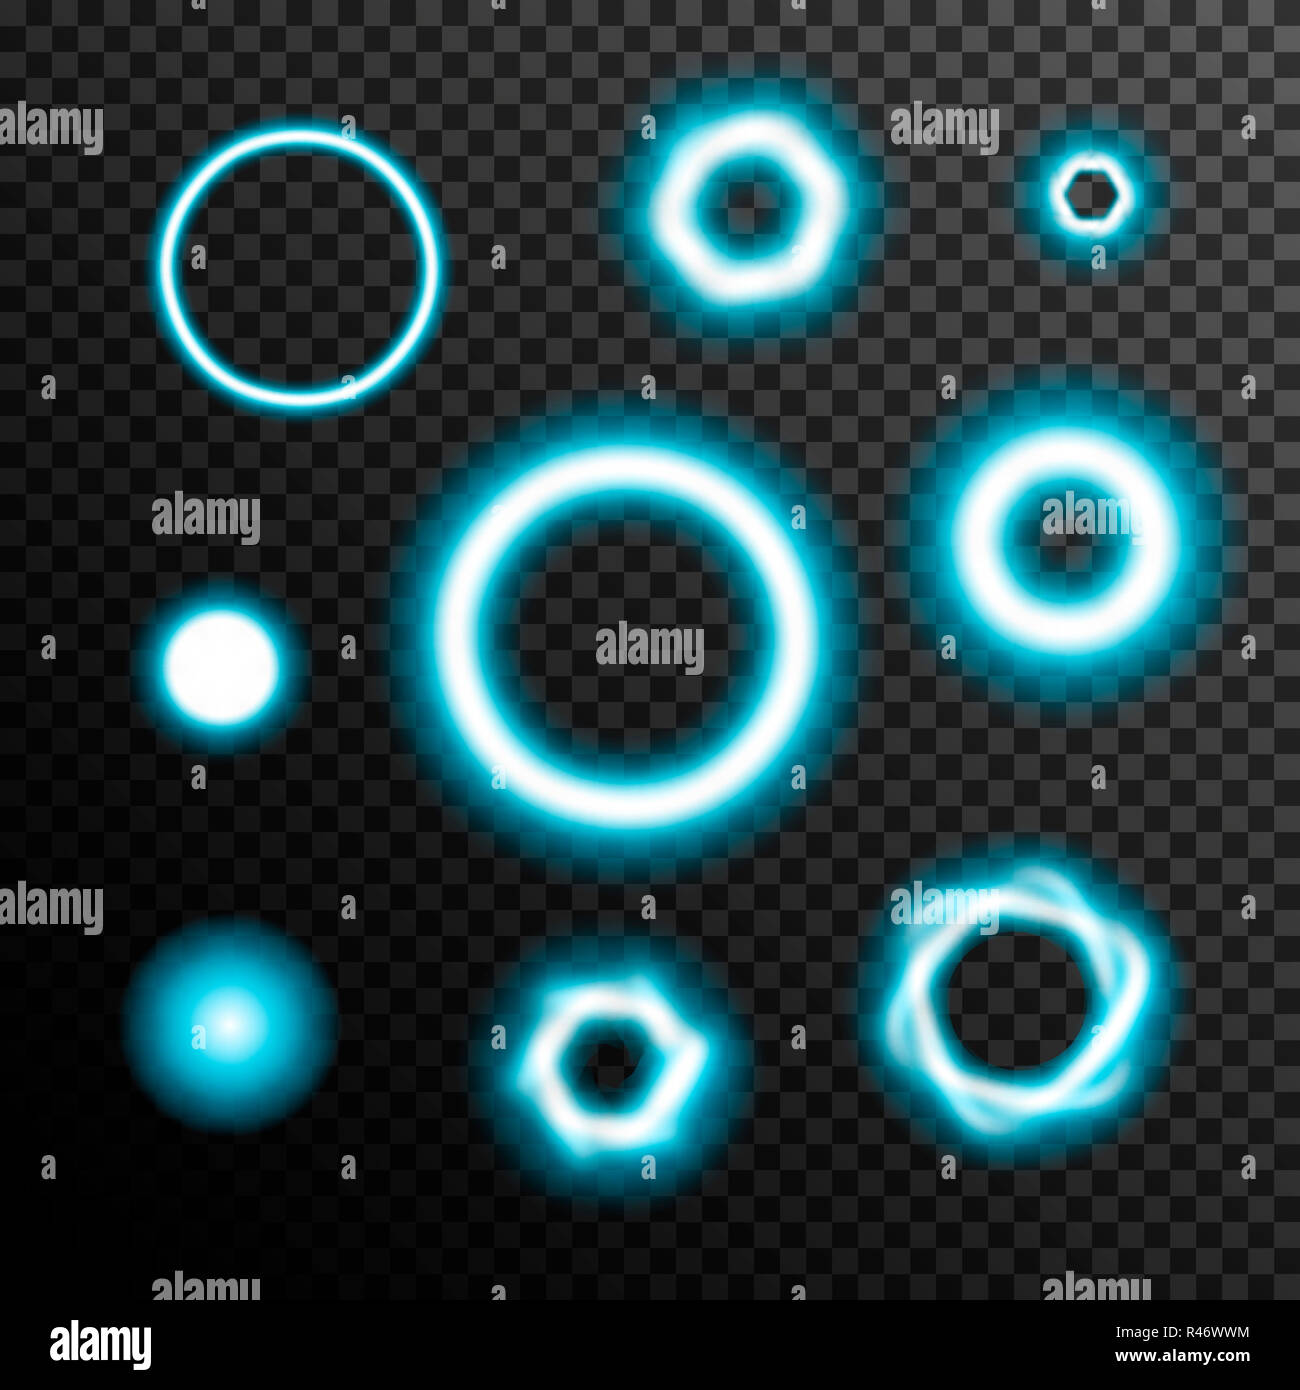 Glowing light burst circles on a plaid dark black background Stock Photo